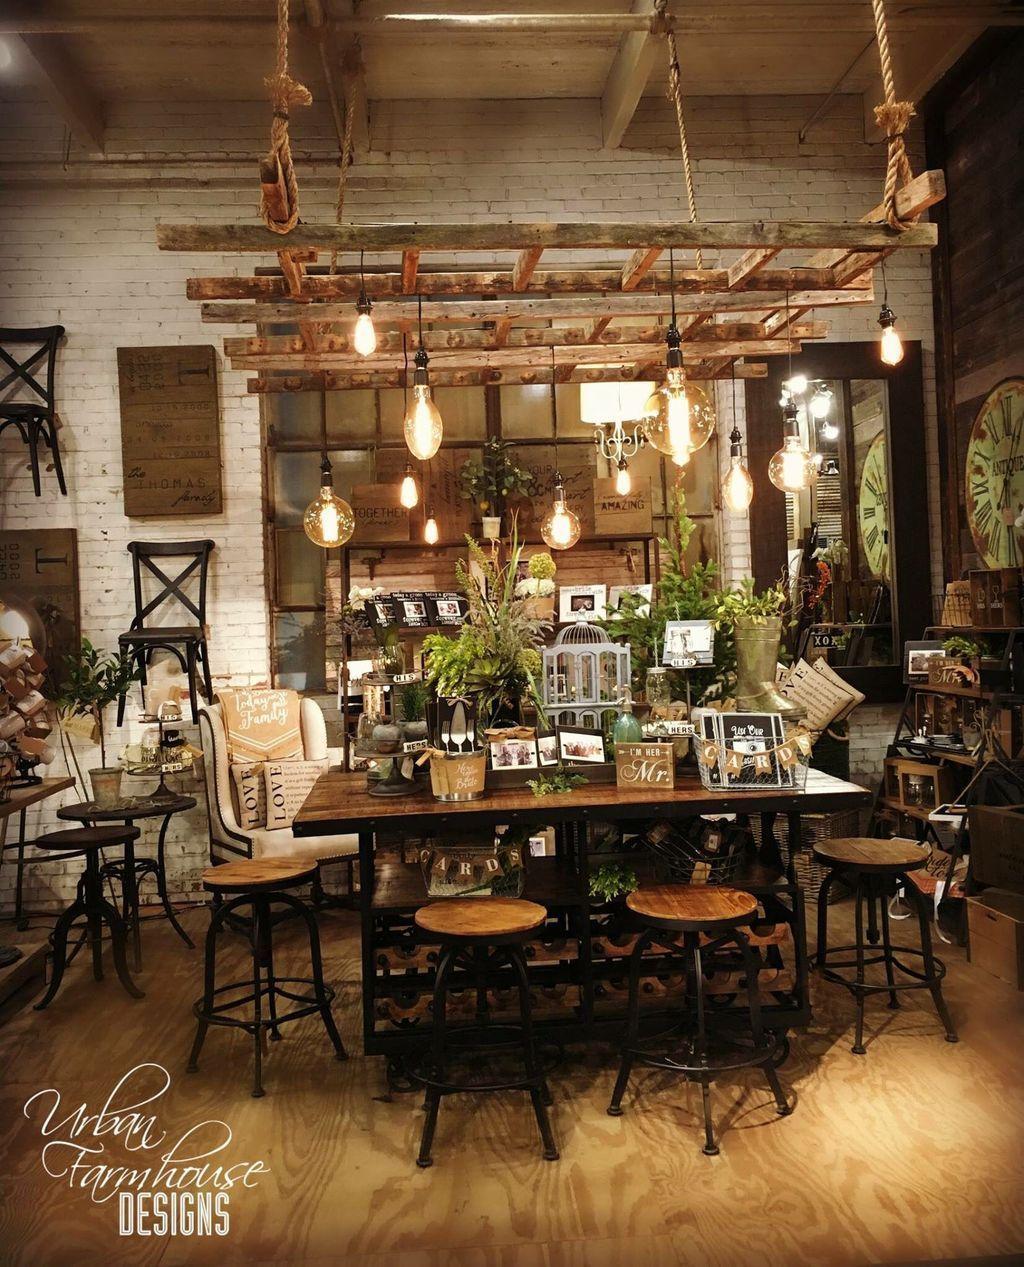 Urban Farmhouse Designs, Urban Farmhouse Dining Room Light